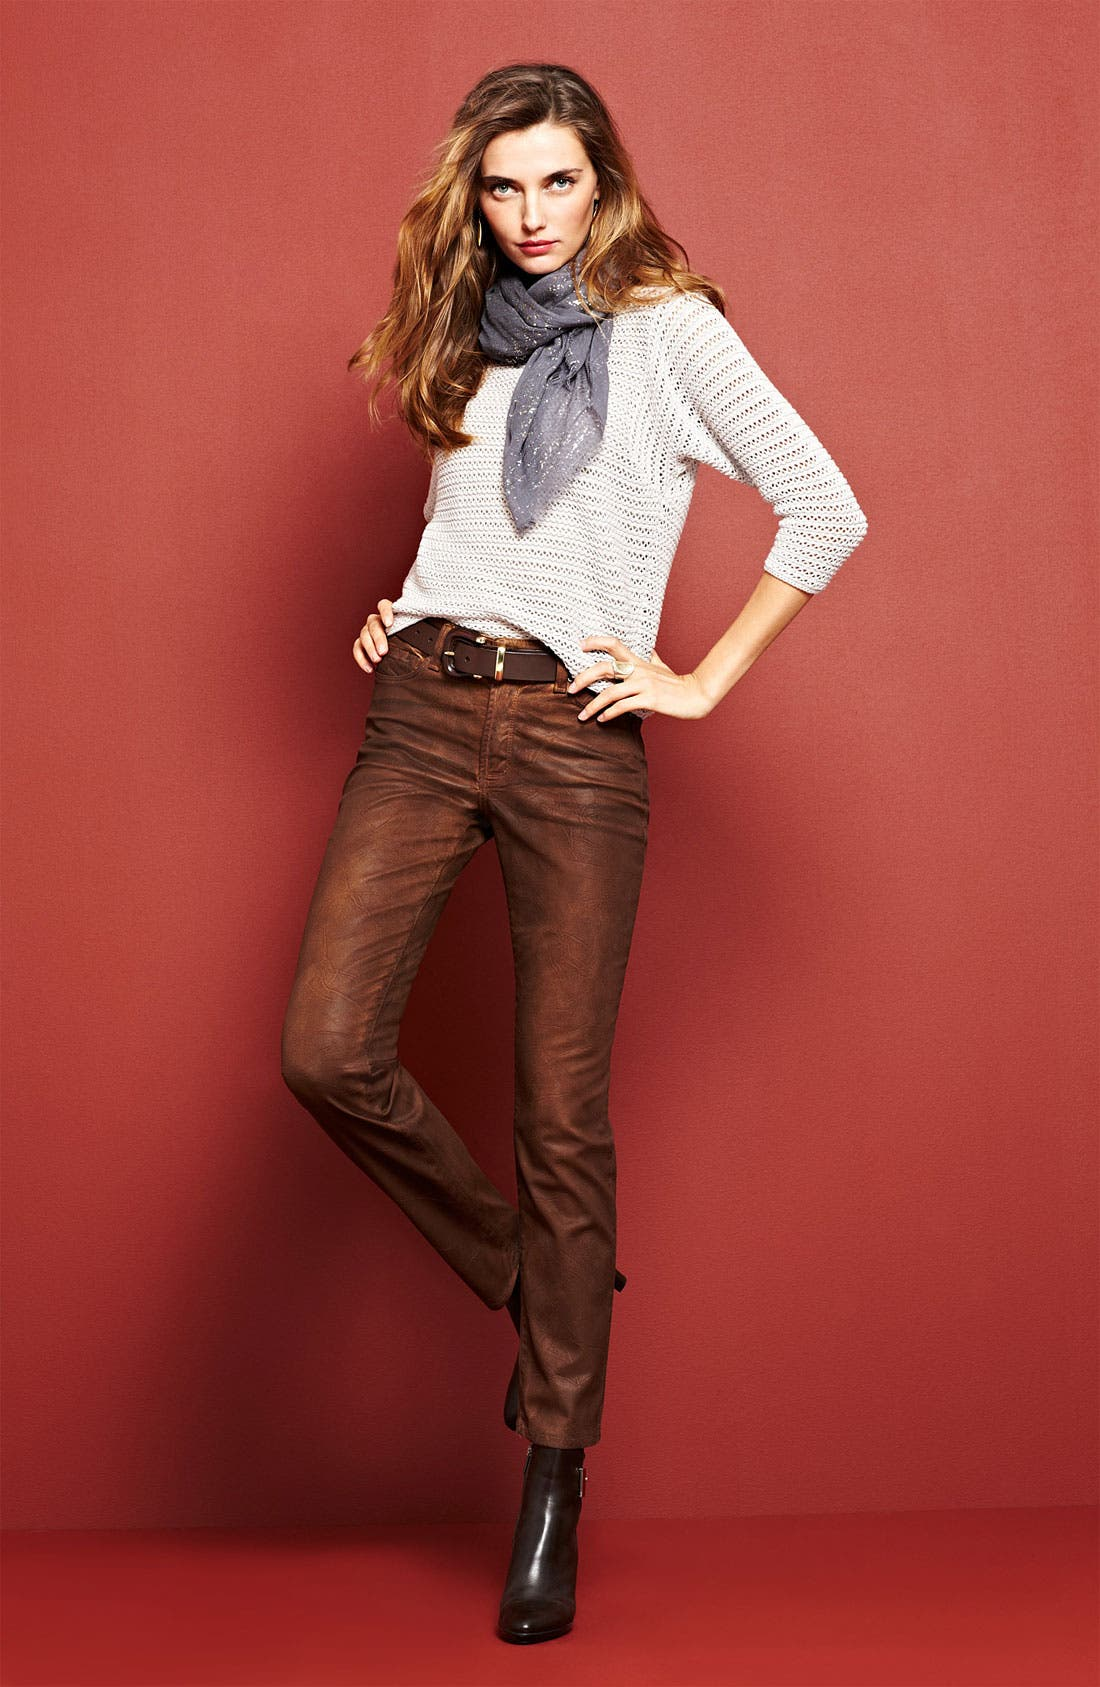 Alternate Image 1 Selected - Holistia Sweater & NYDJ 'Sheri' Coated Jeans